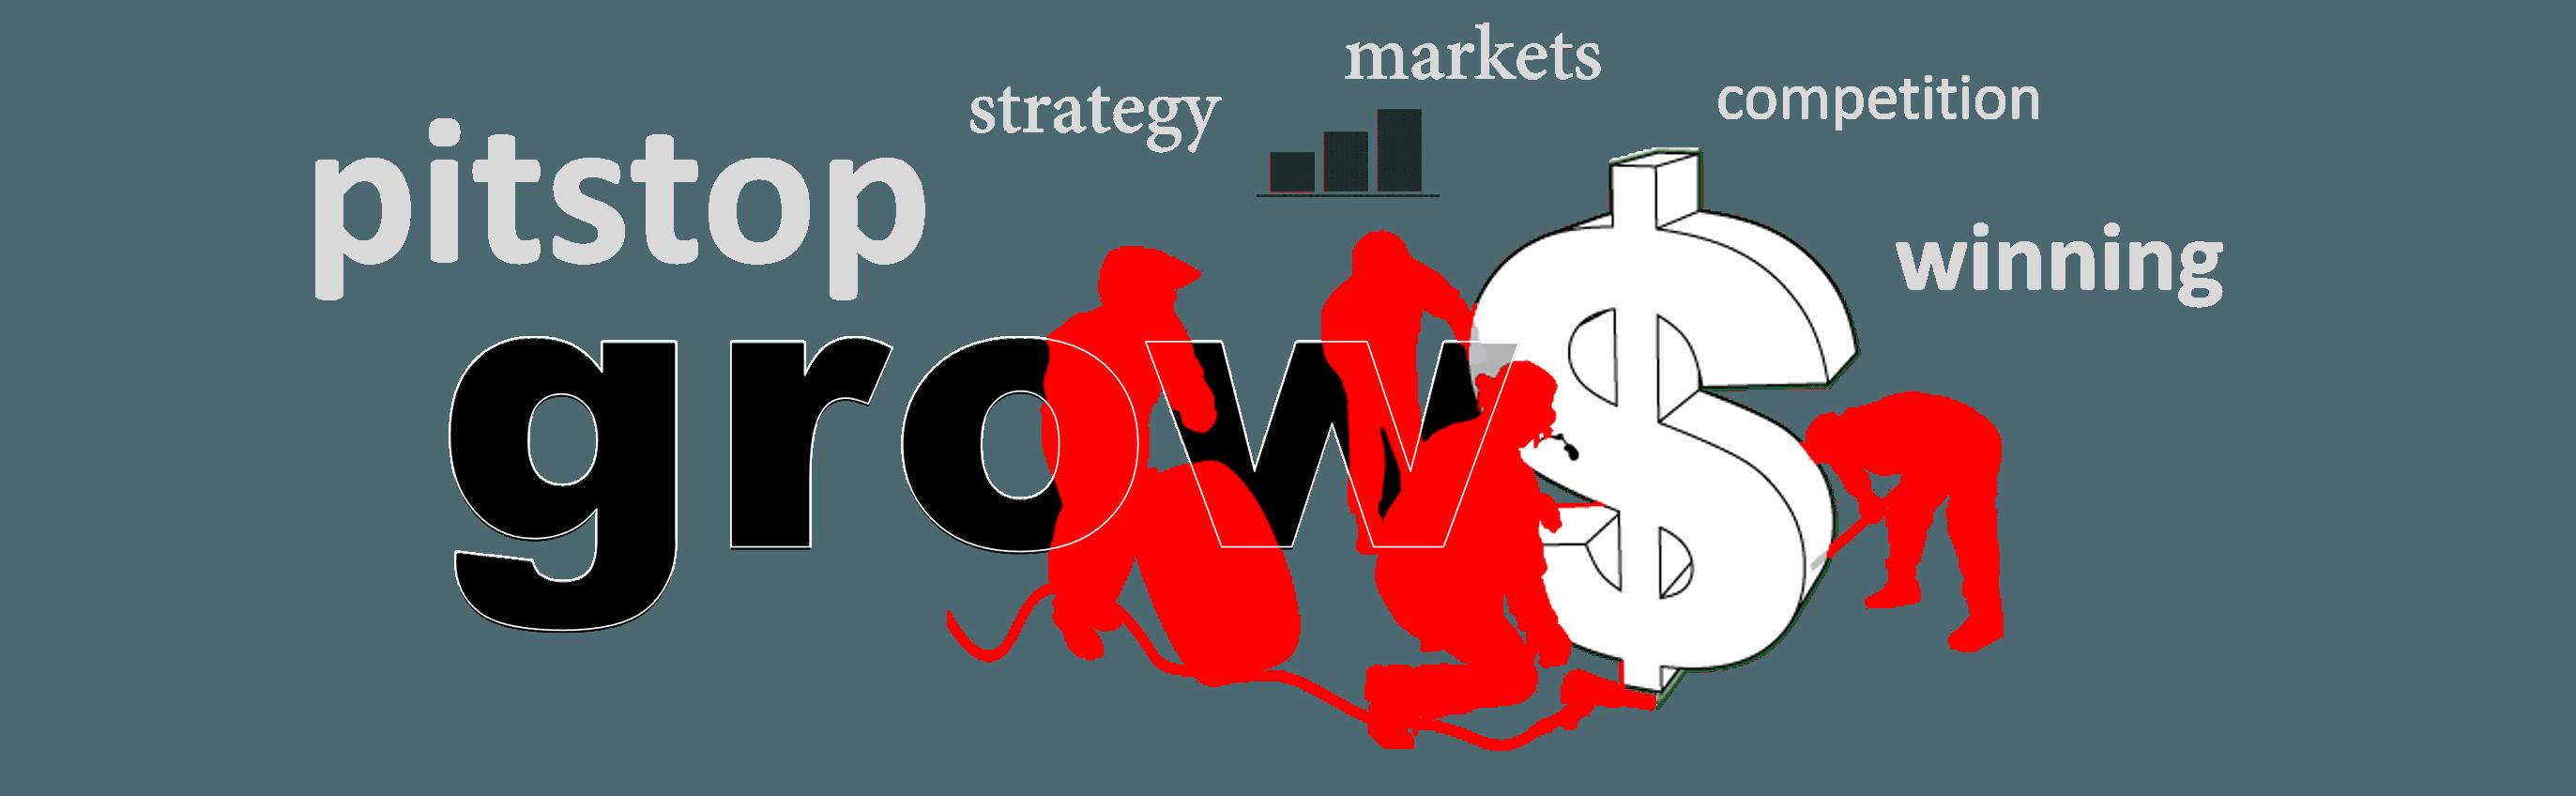 growth-pitstop-headers